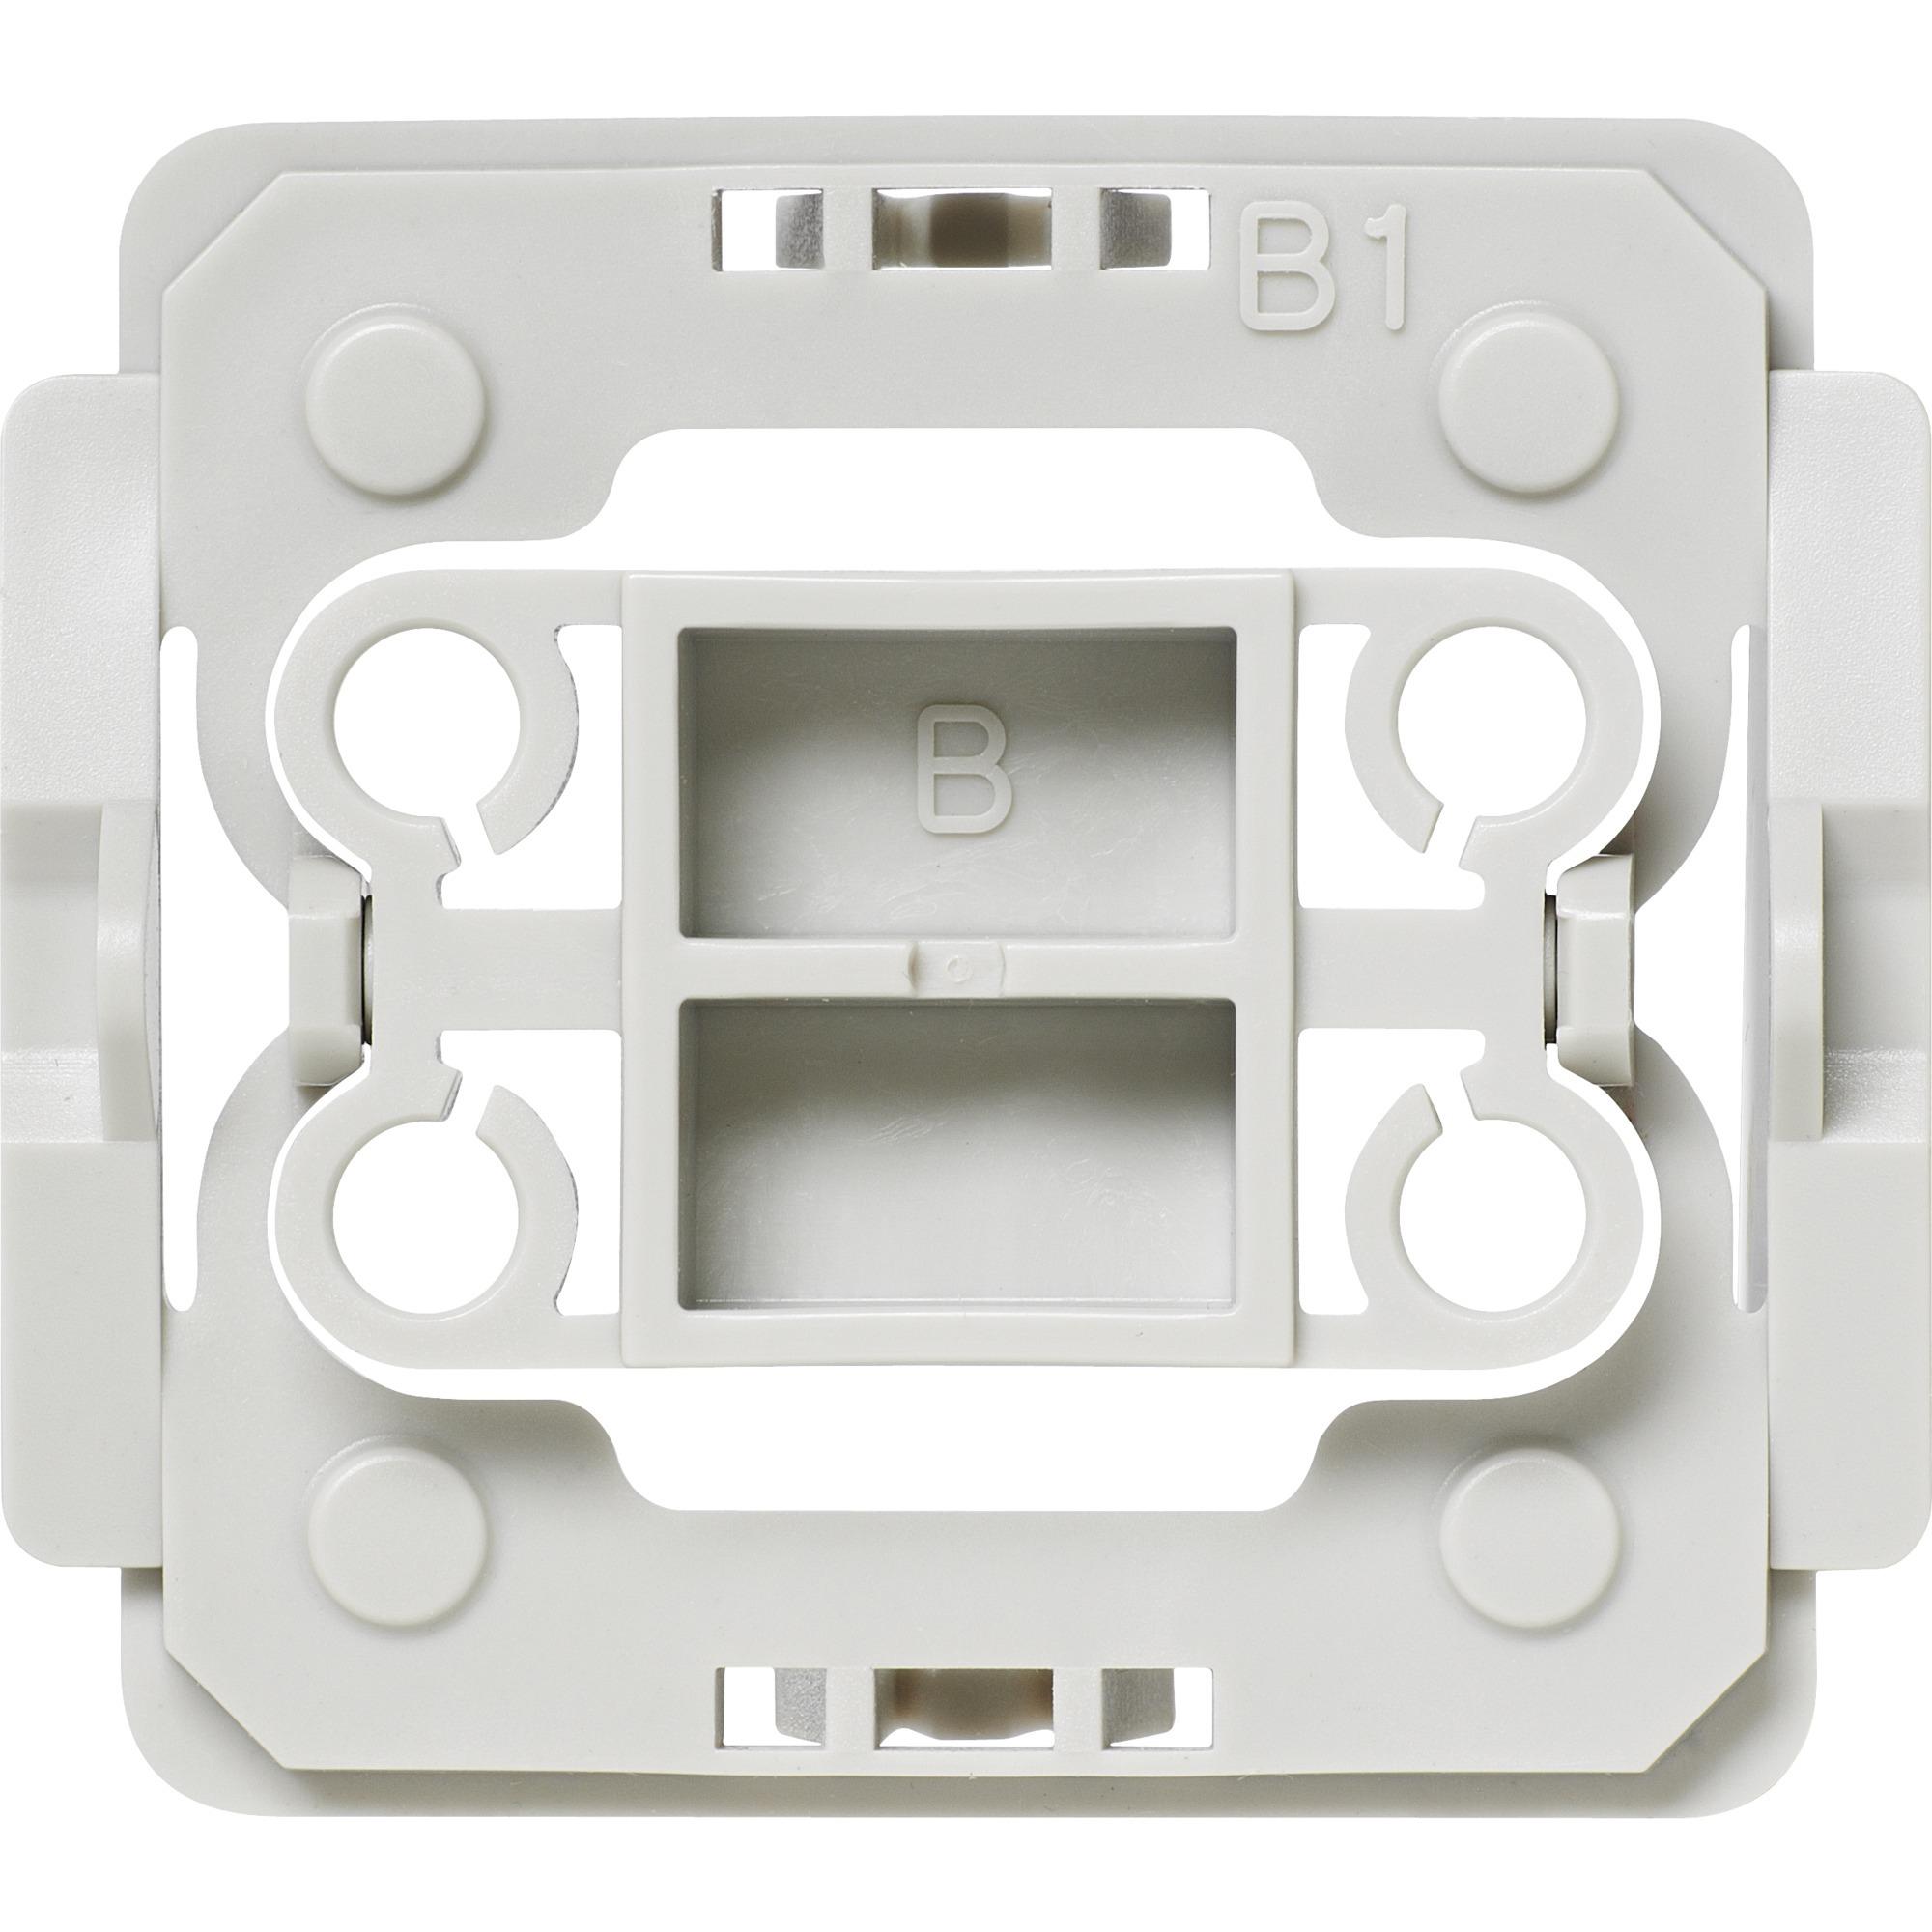 EQ3-ADA-B1 Atenuador e interruptor Integrado Blanco, Adaptador